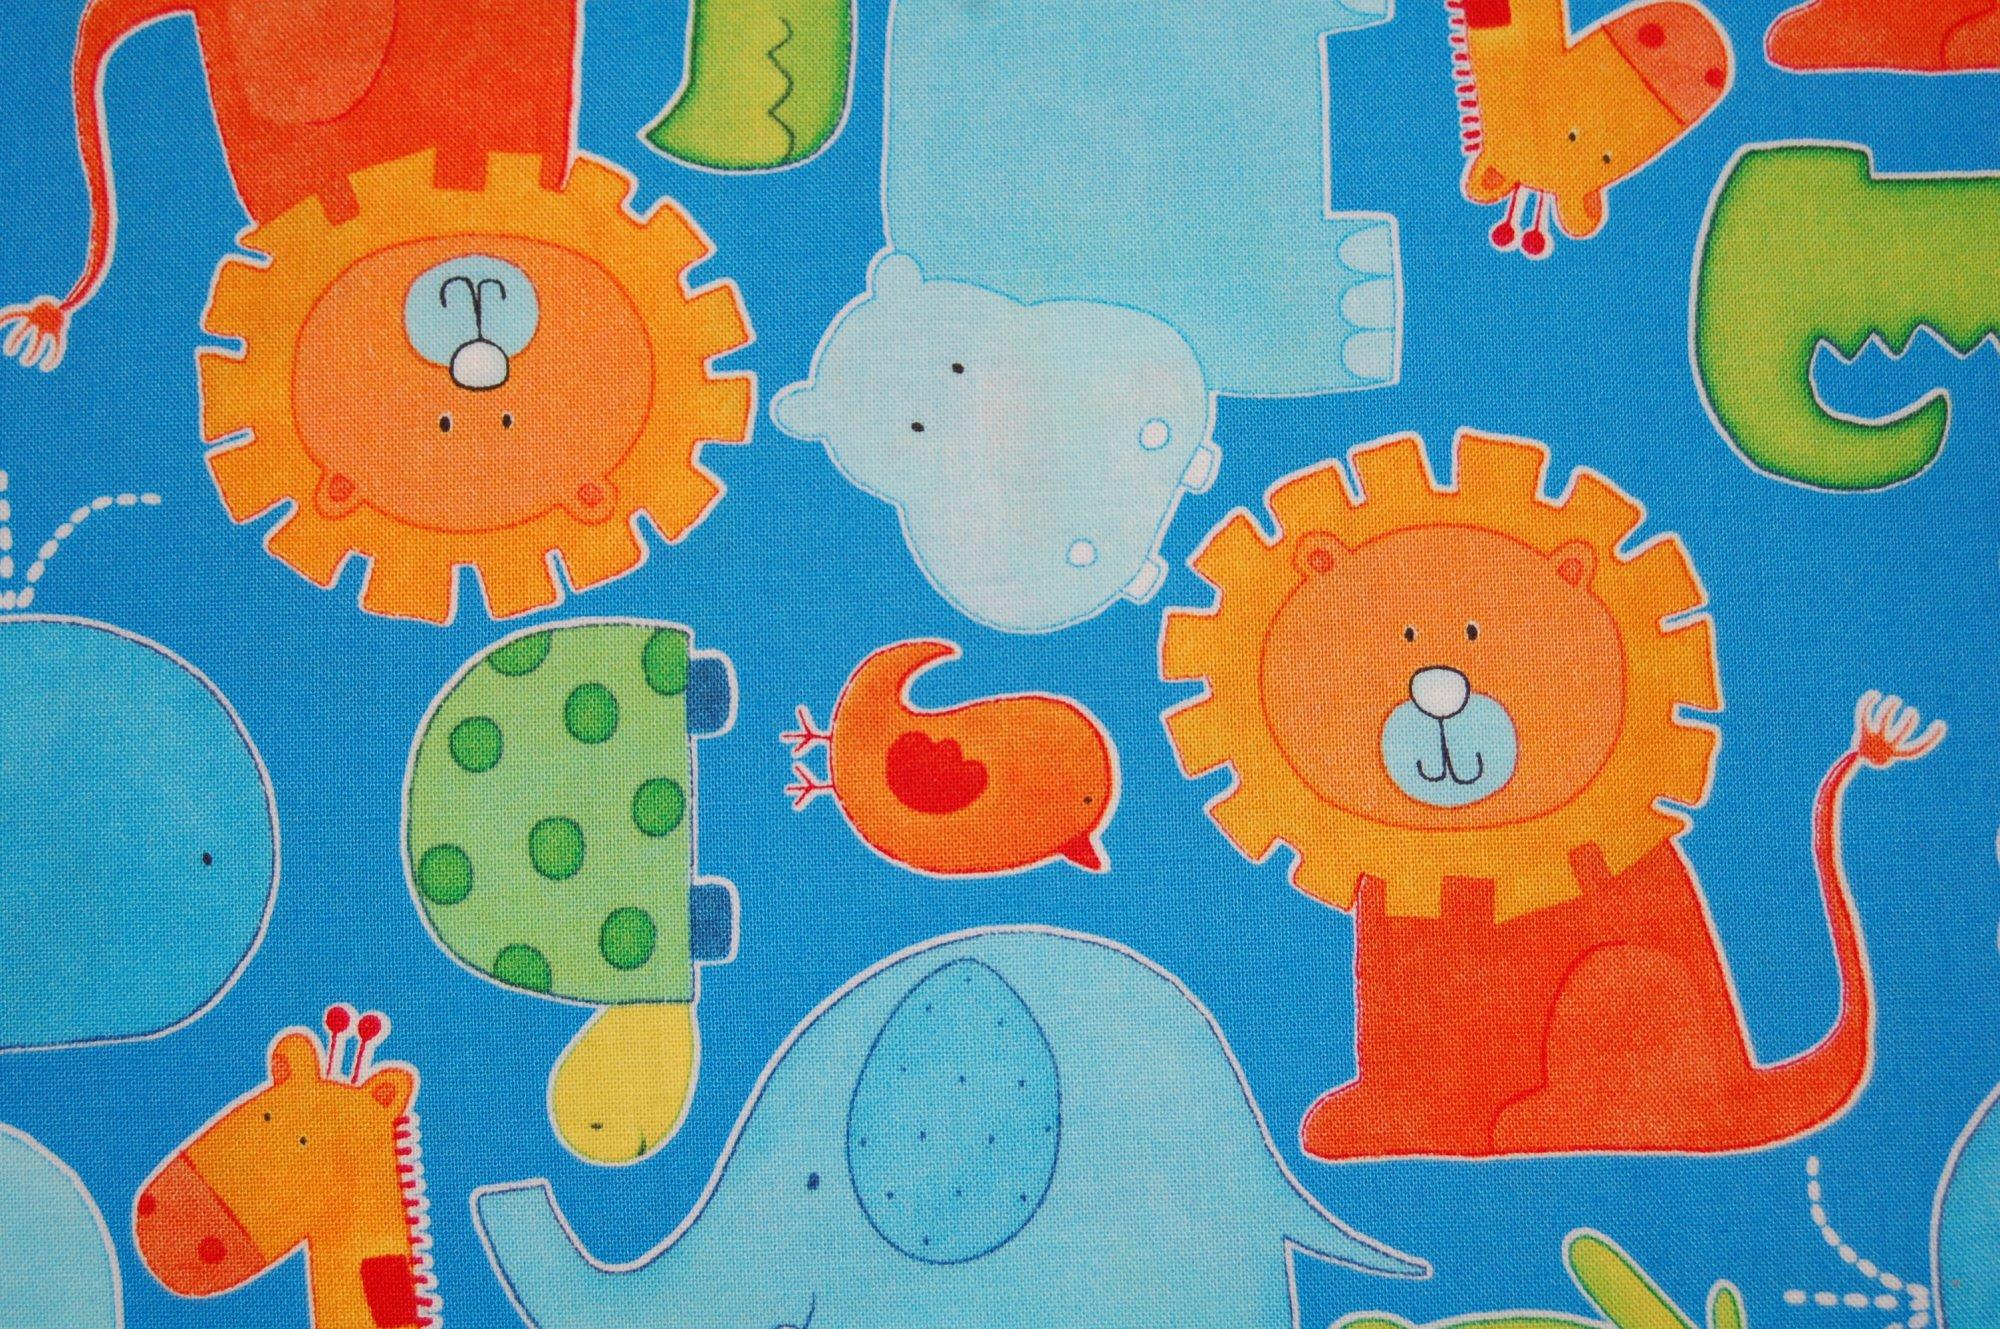 ABC Safari - Animals from Diane Eichler for Studio E